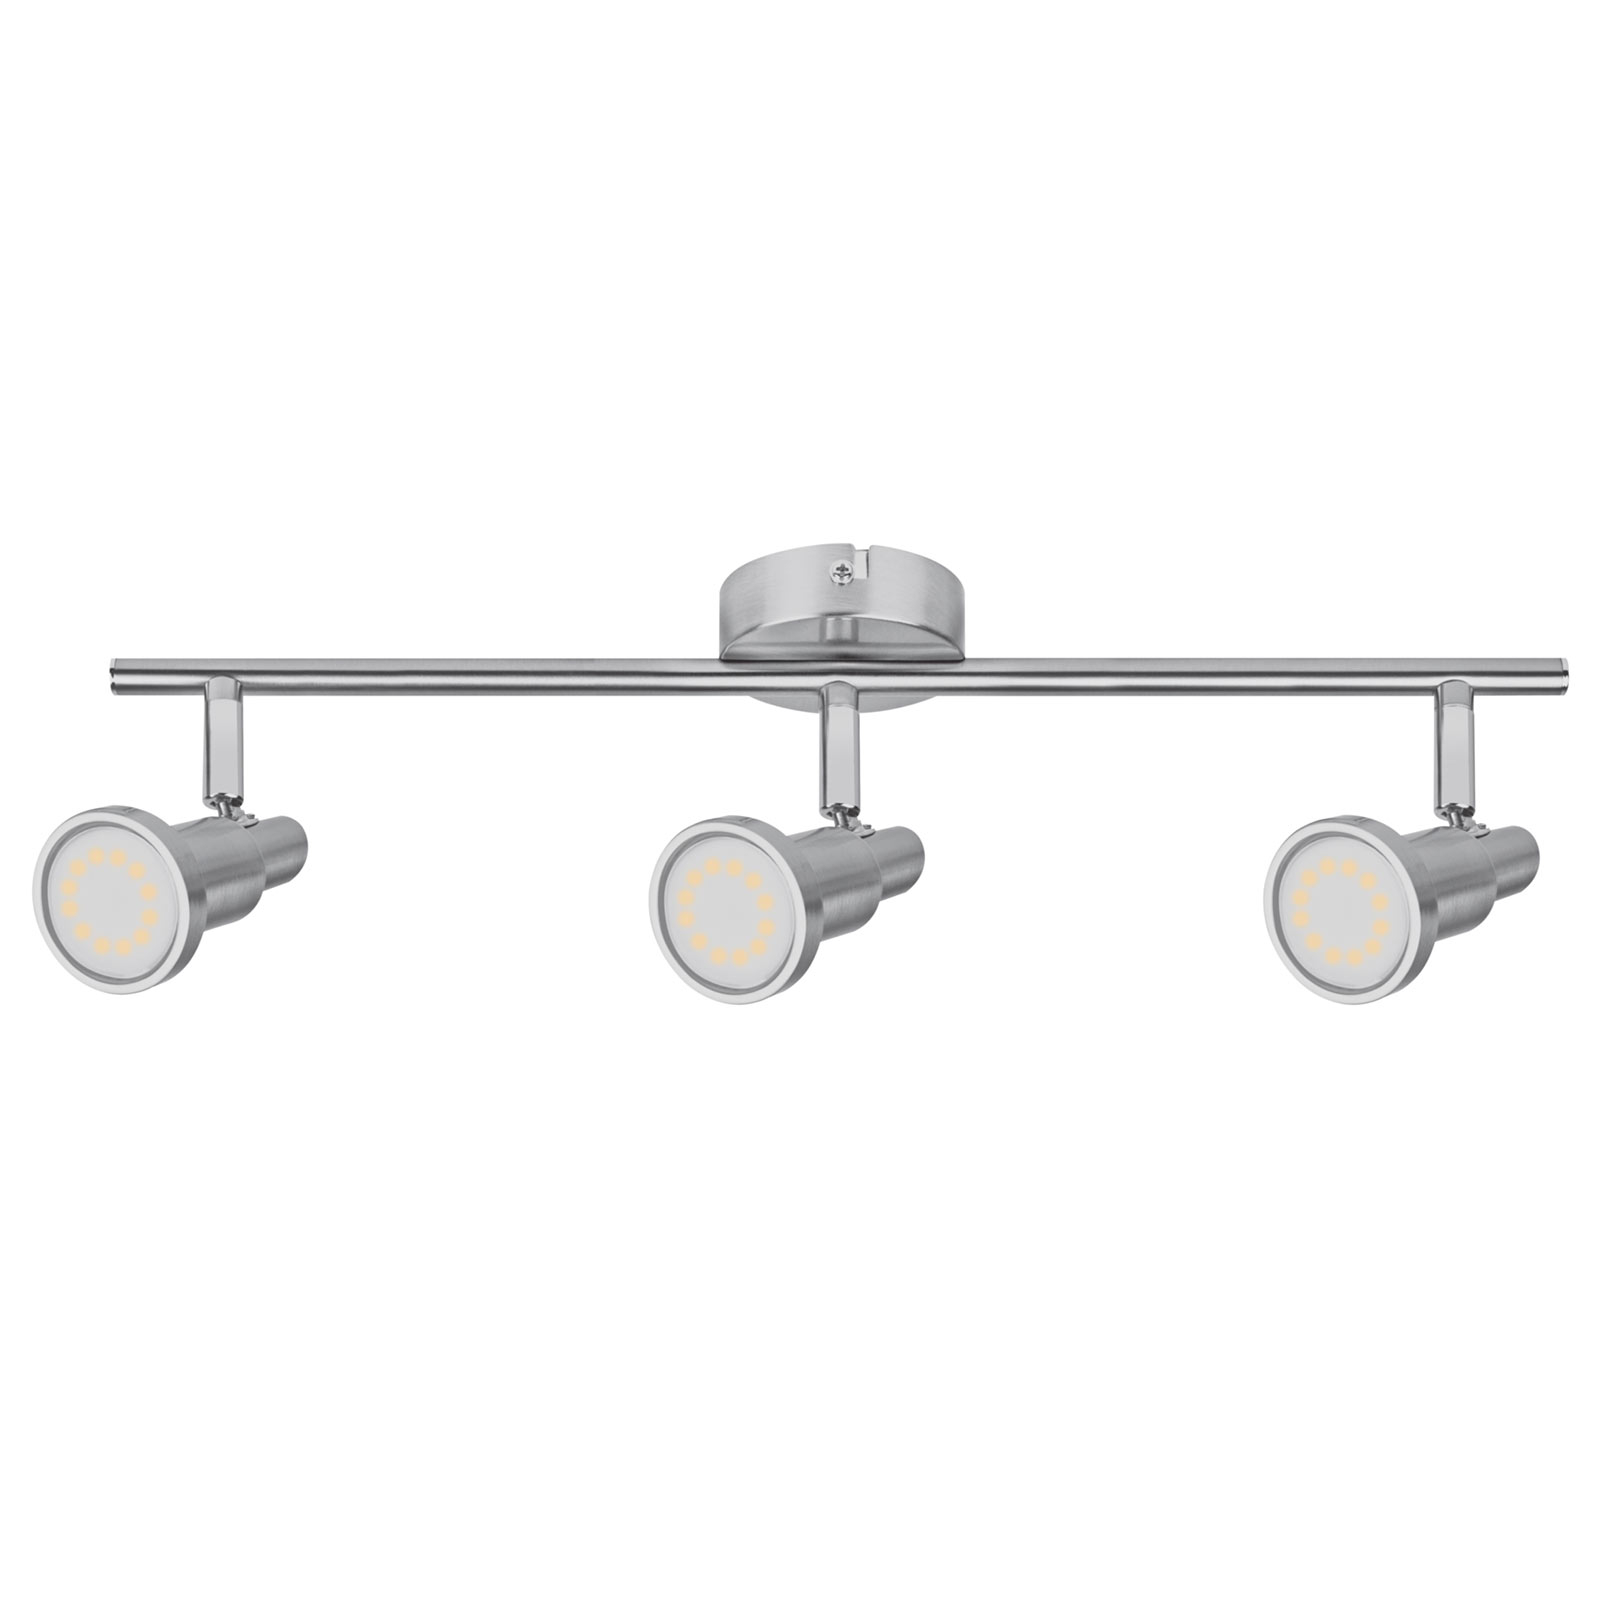 LEDVANCE Niclas LED-kohdevalaisin nikkeli 3-lampp.